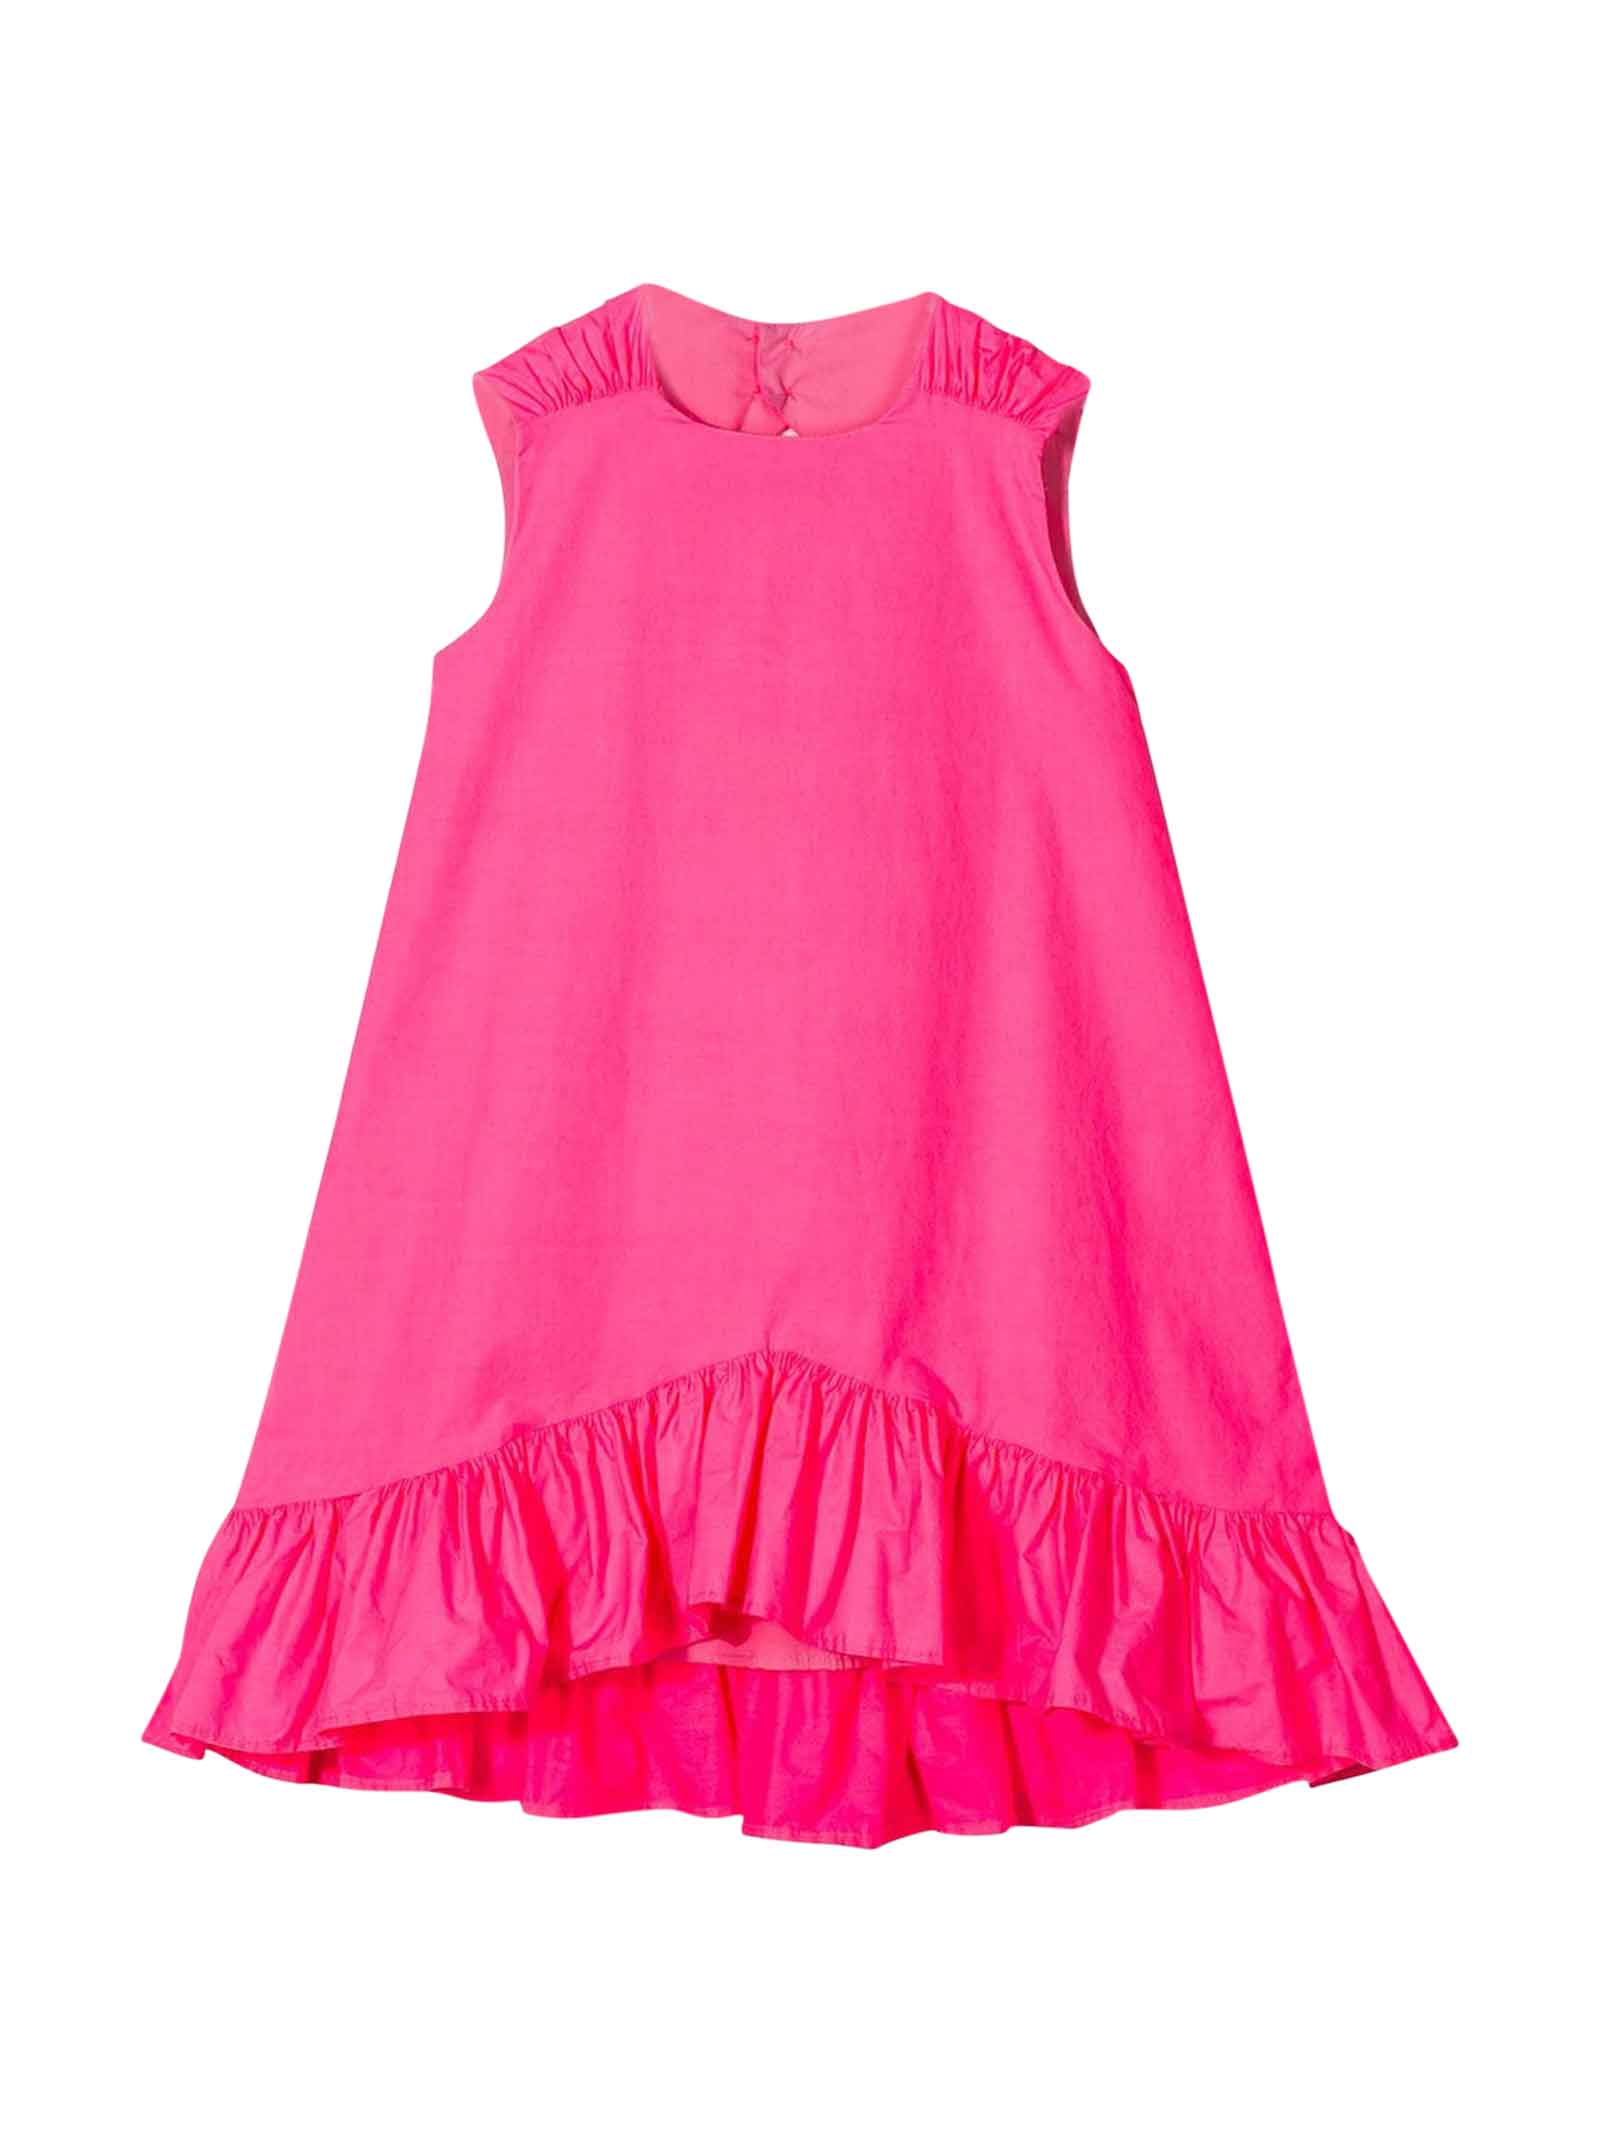 Buy MSGM Fuchsia Dress Teen online, shop MSGM with free shipping